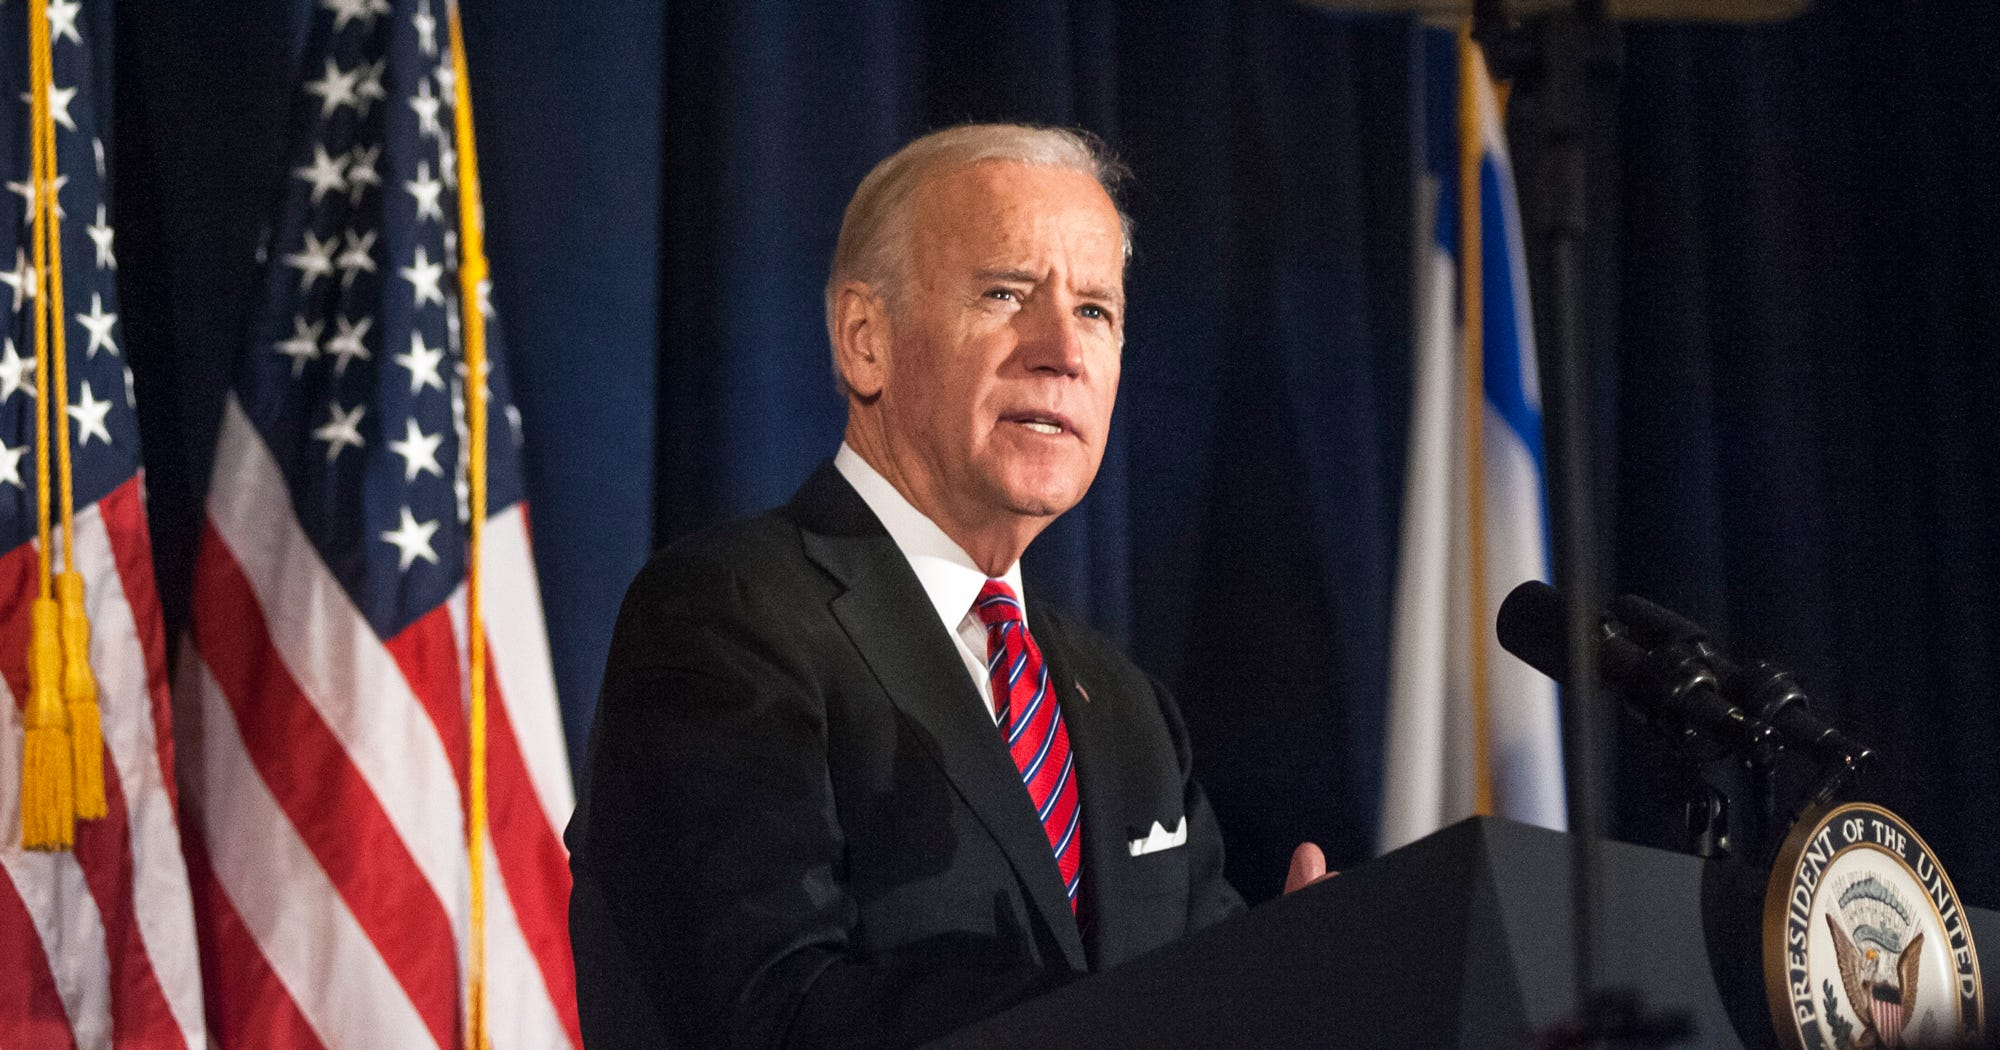 We Talked To Joe Biden About Rape & He Said Something Brilliant